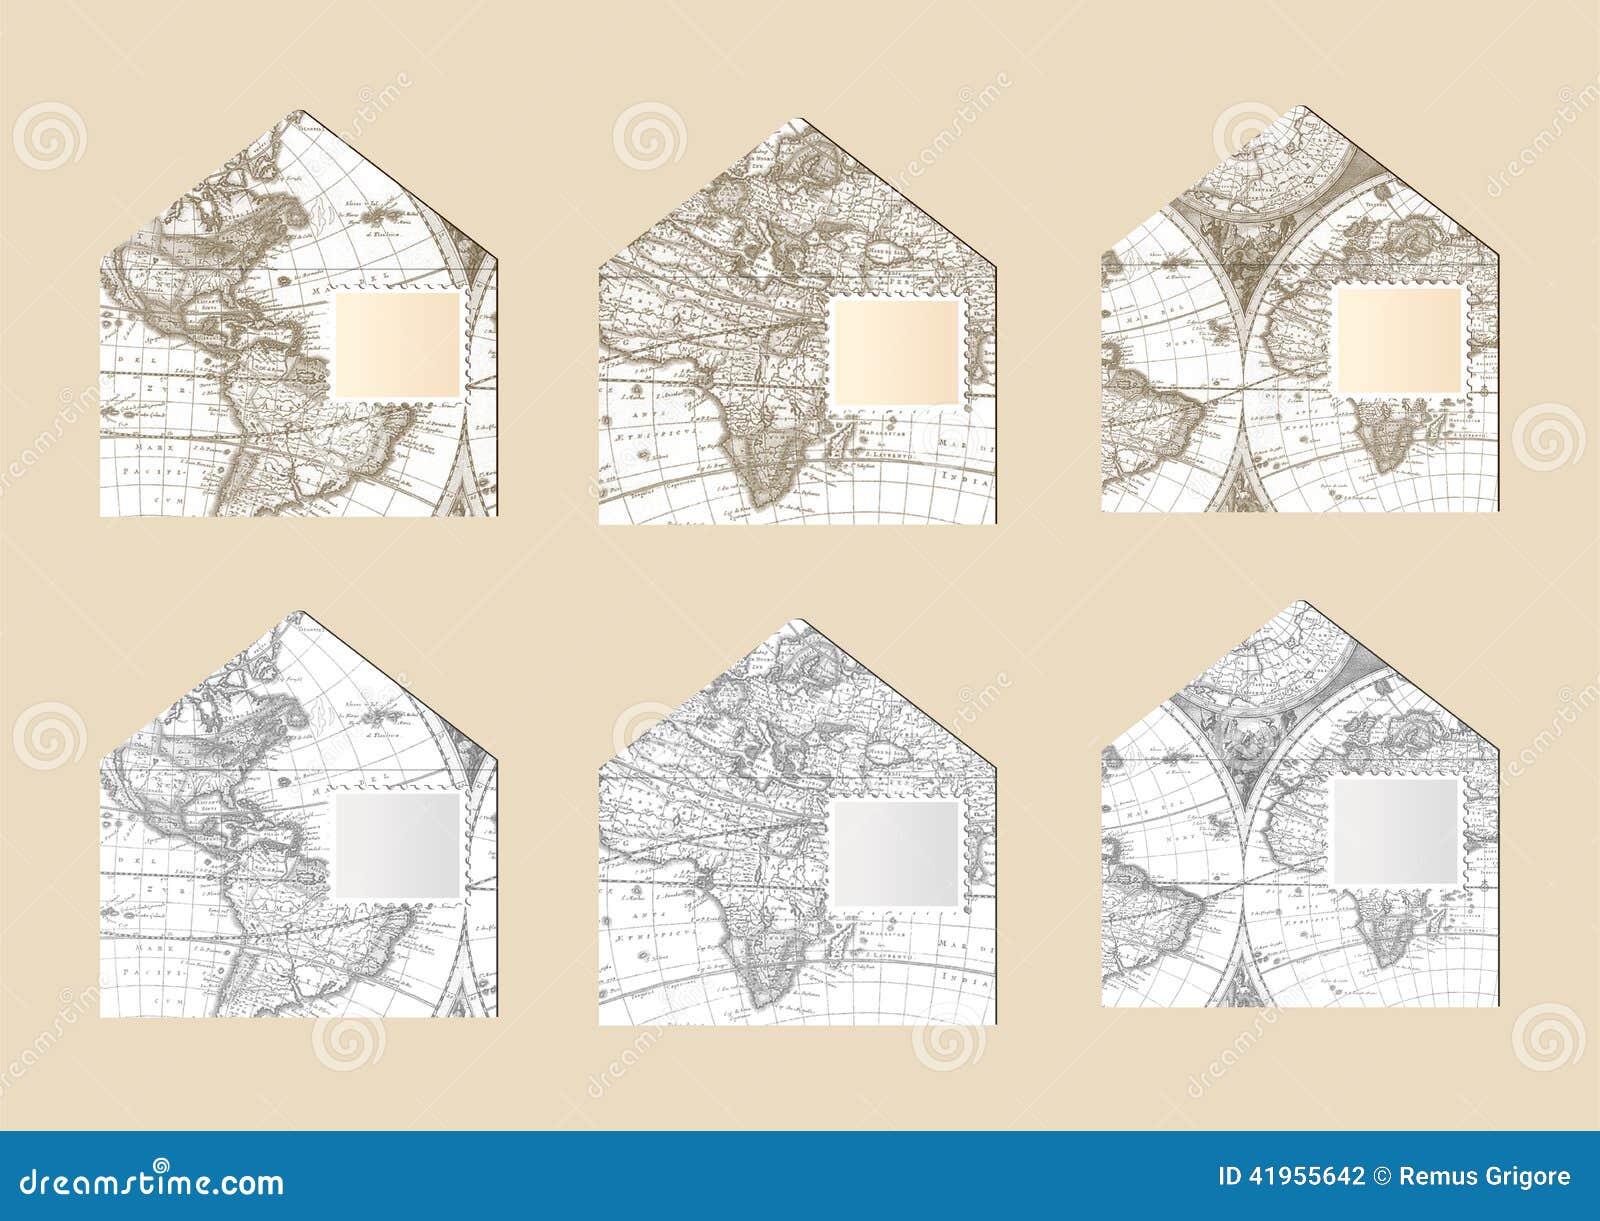 Stare map koperty